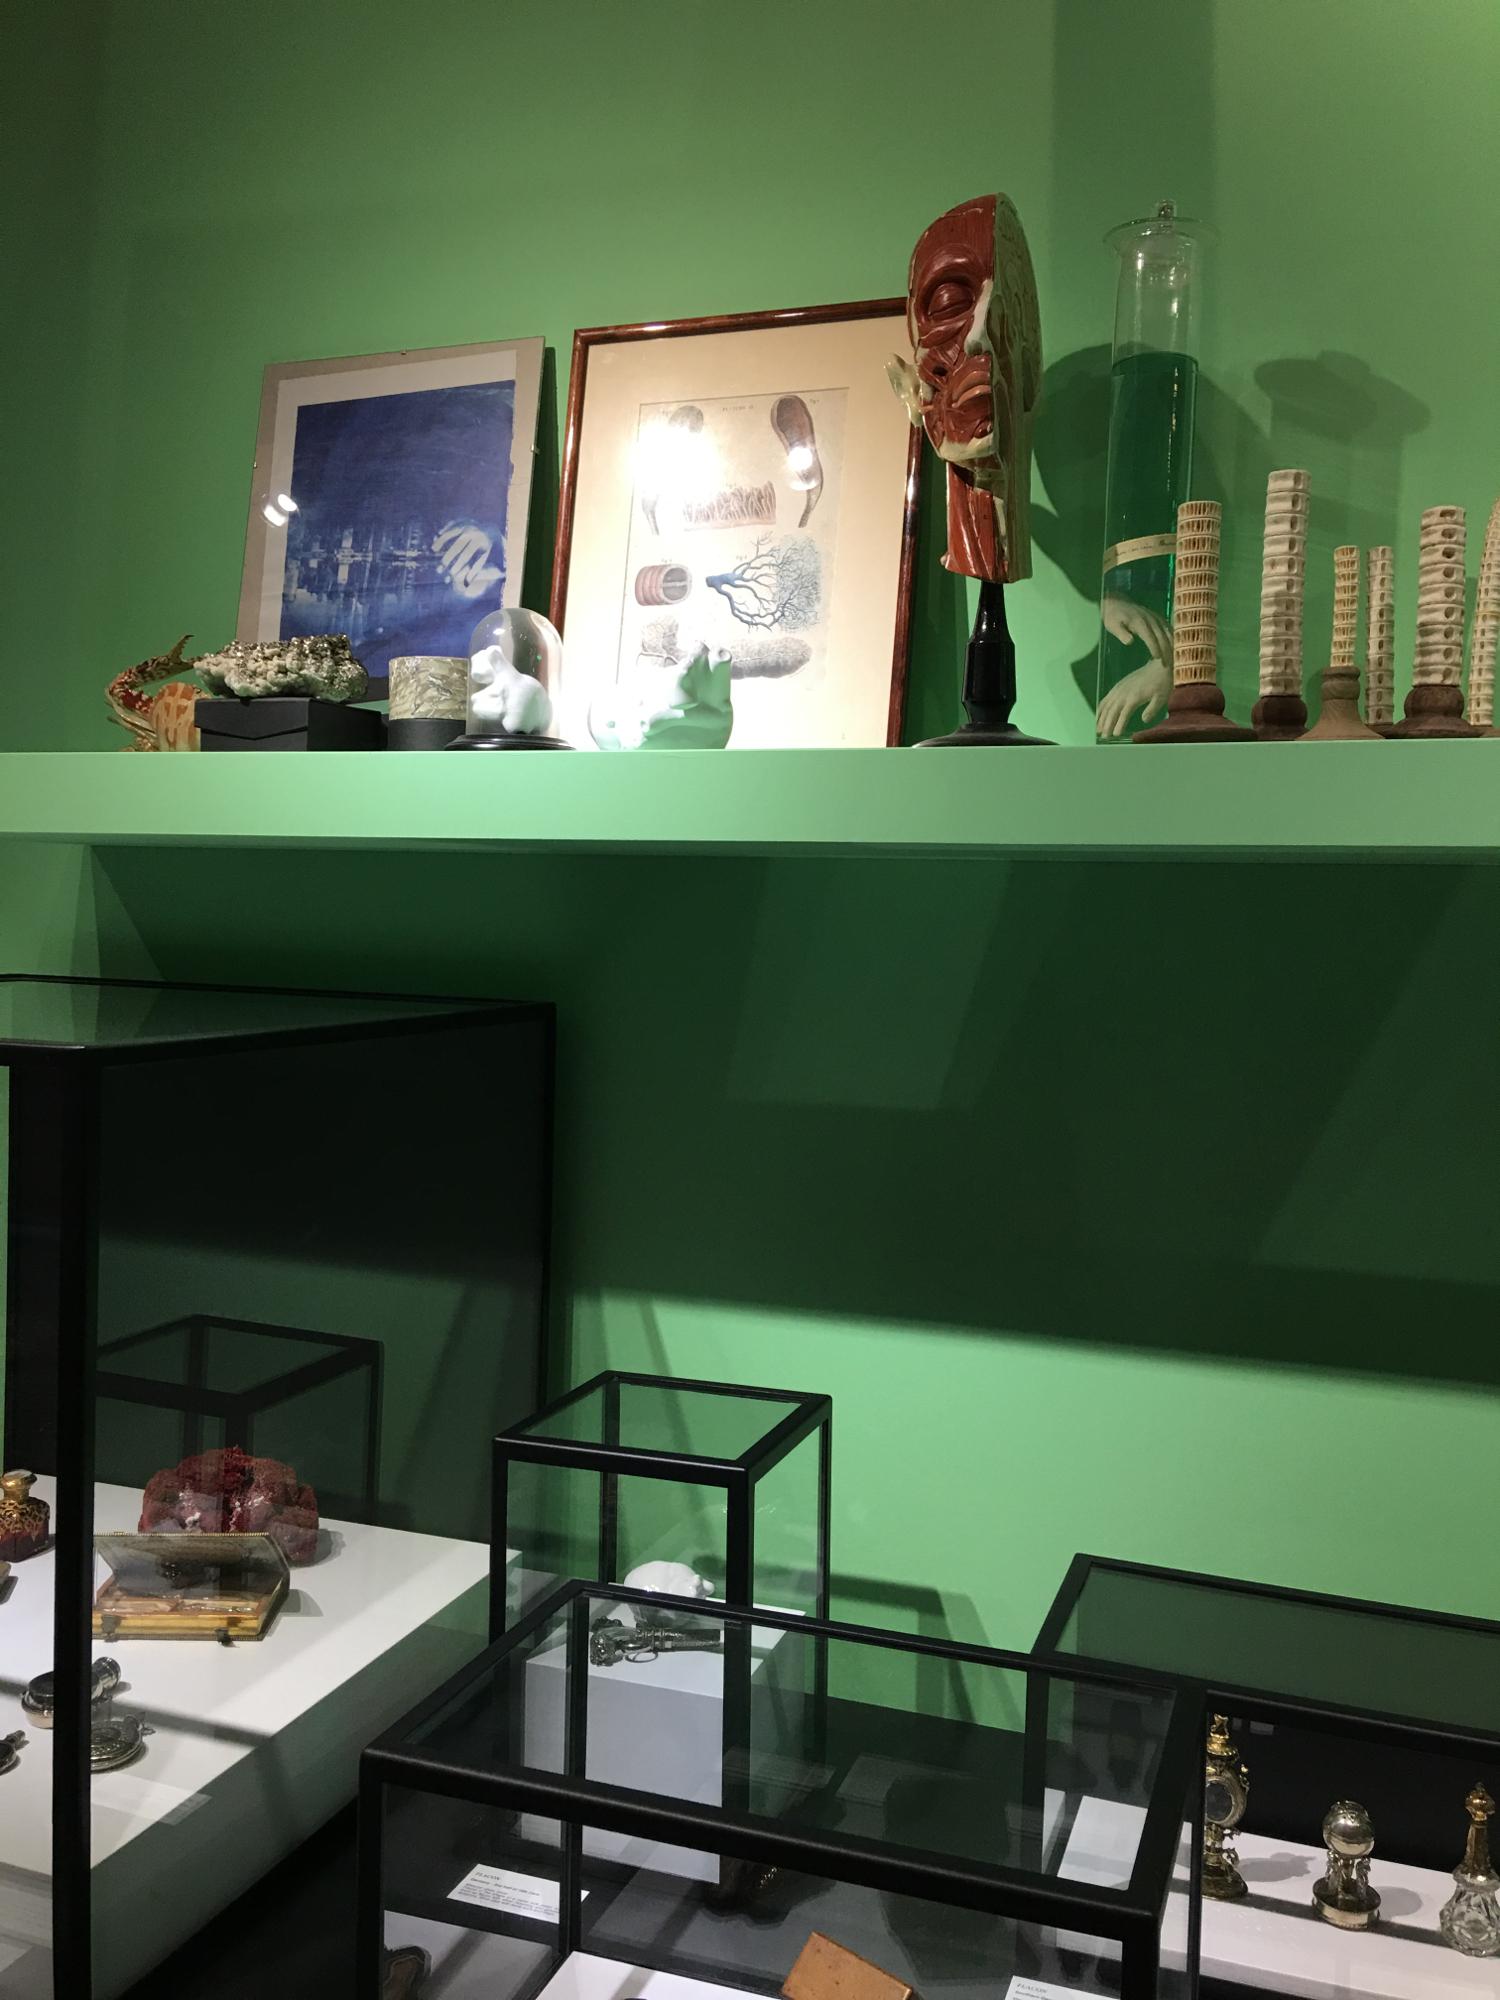 rocaille-blog-venezia-palazzo-mocenigo-cabinet-of-curiosities-collezione-storp-profumo-19